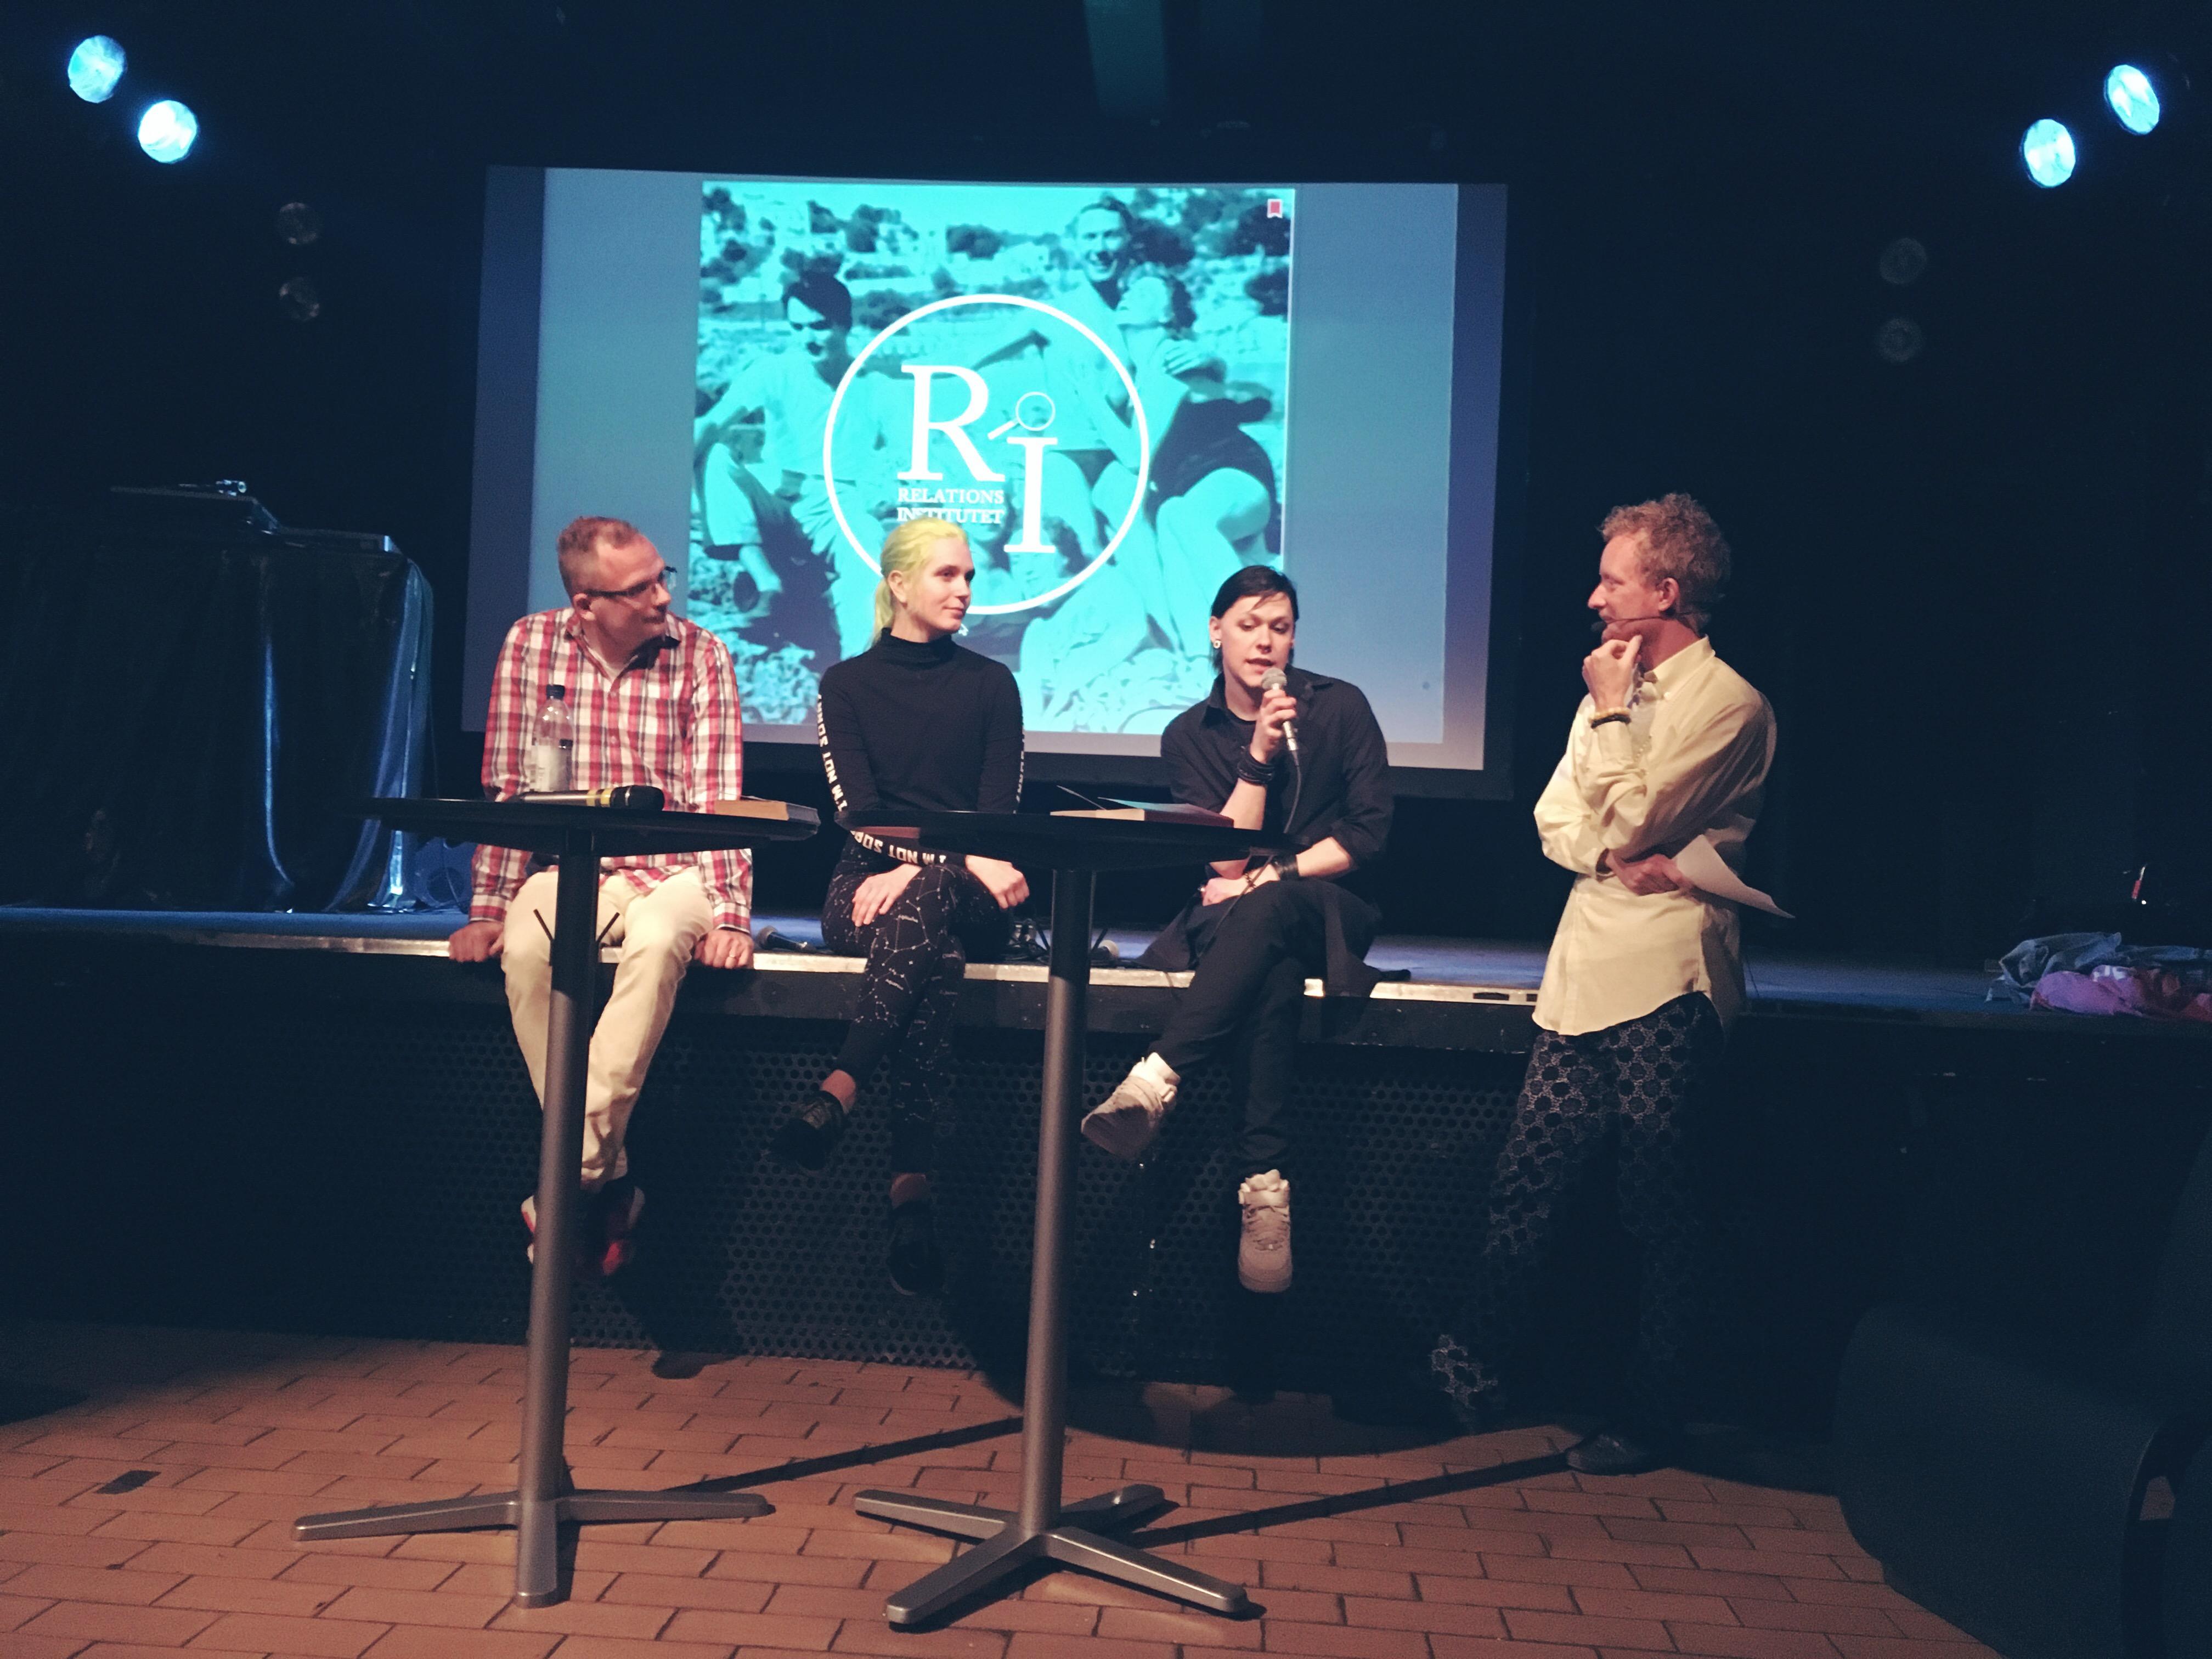 Fyra paneldeltagare på scenkanten i en mysig klubblokal